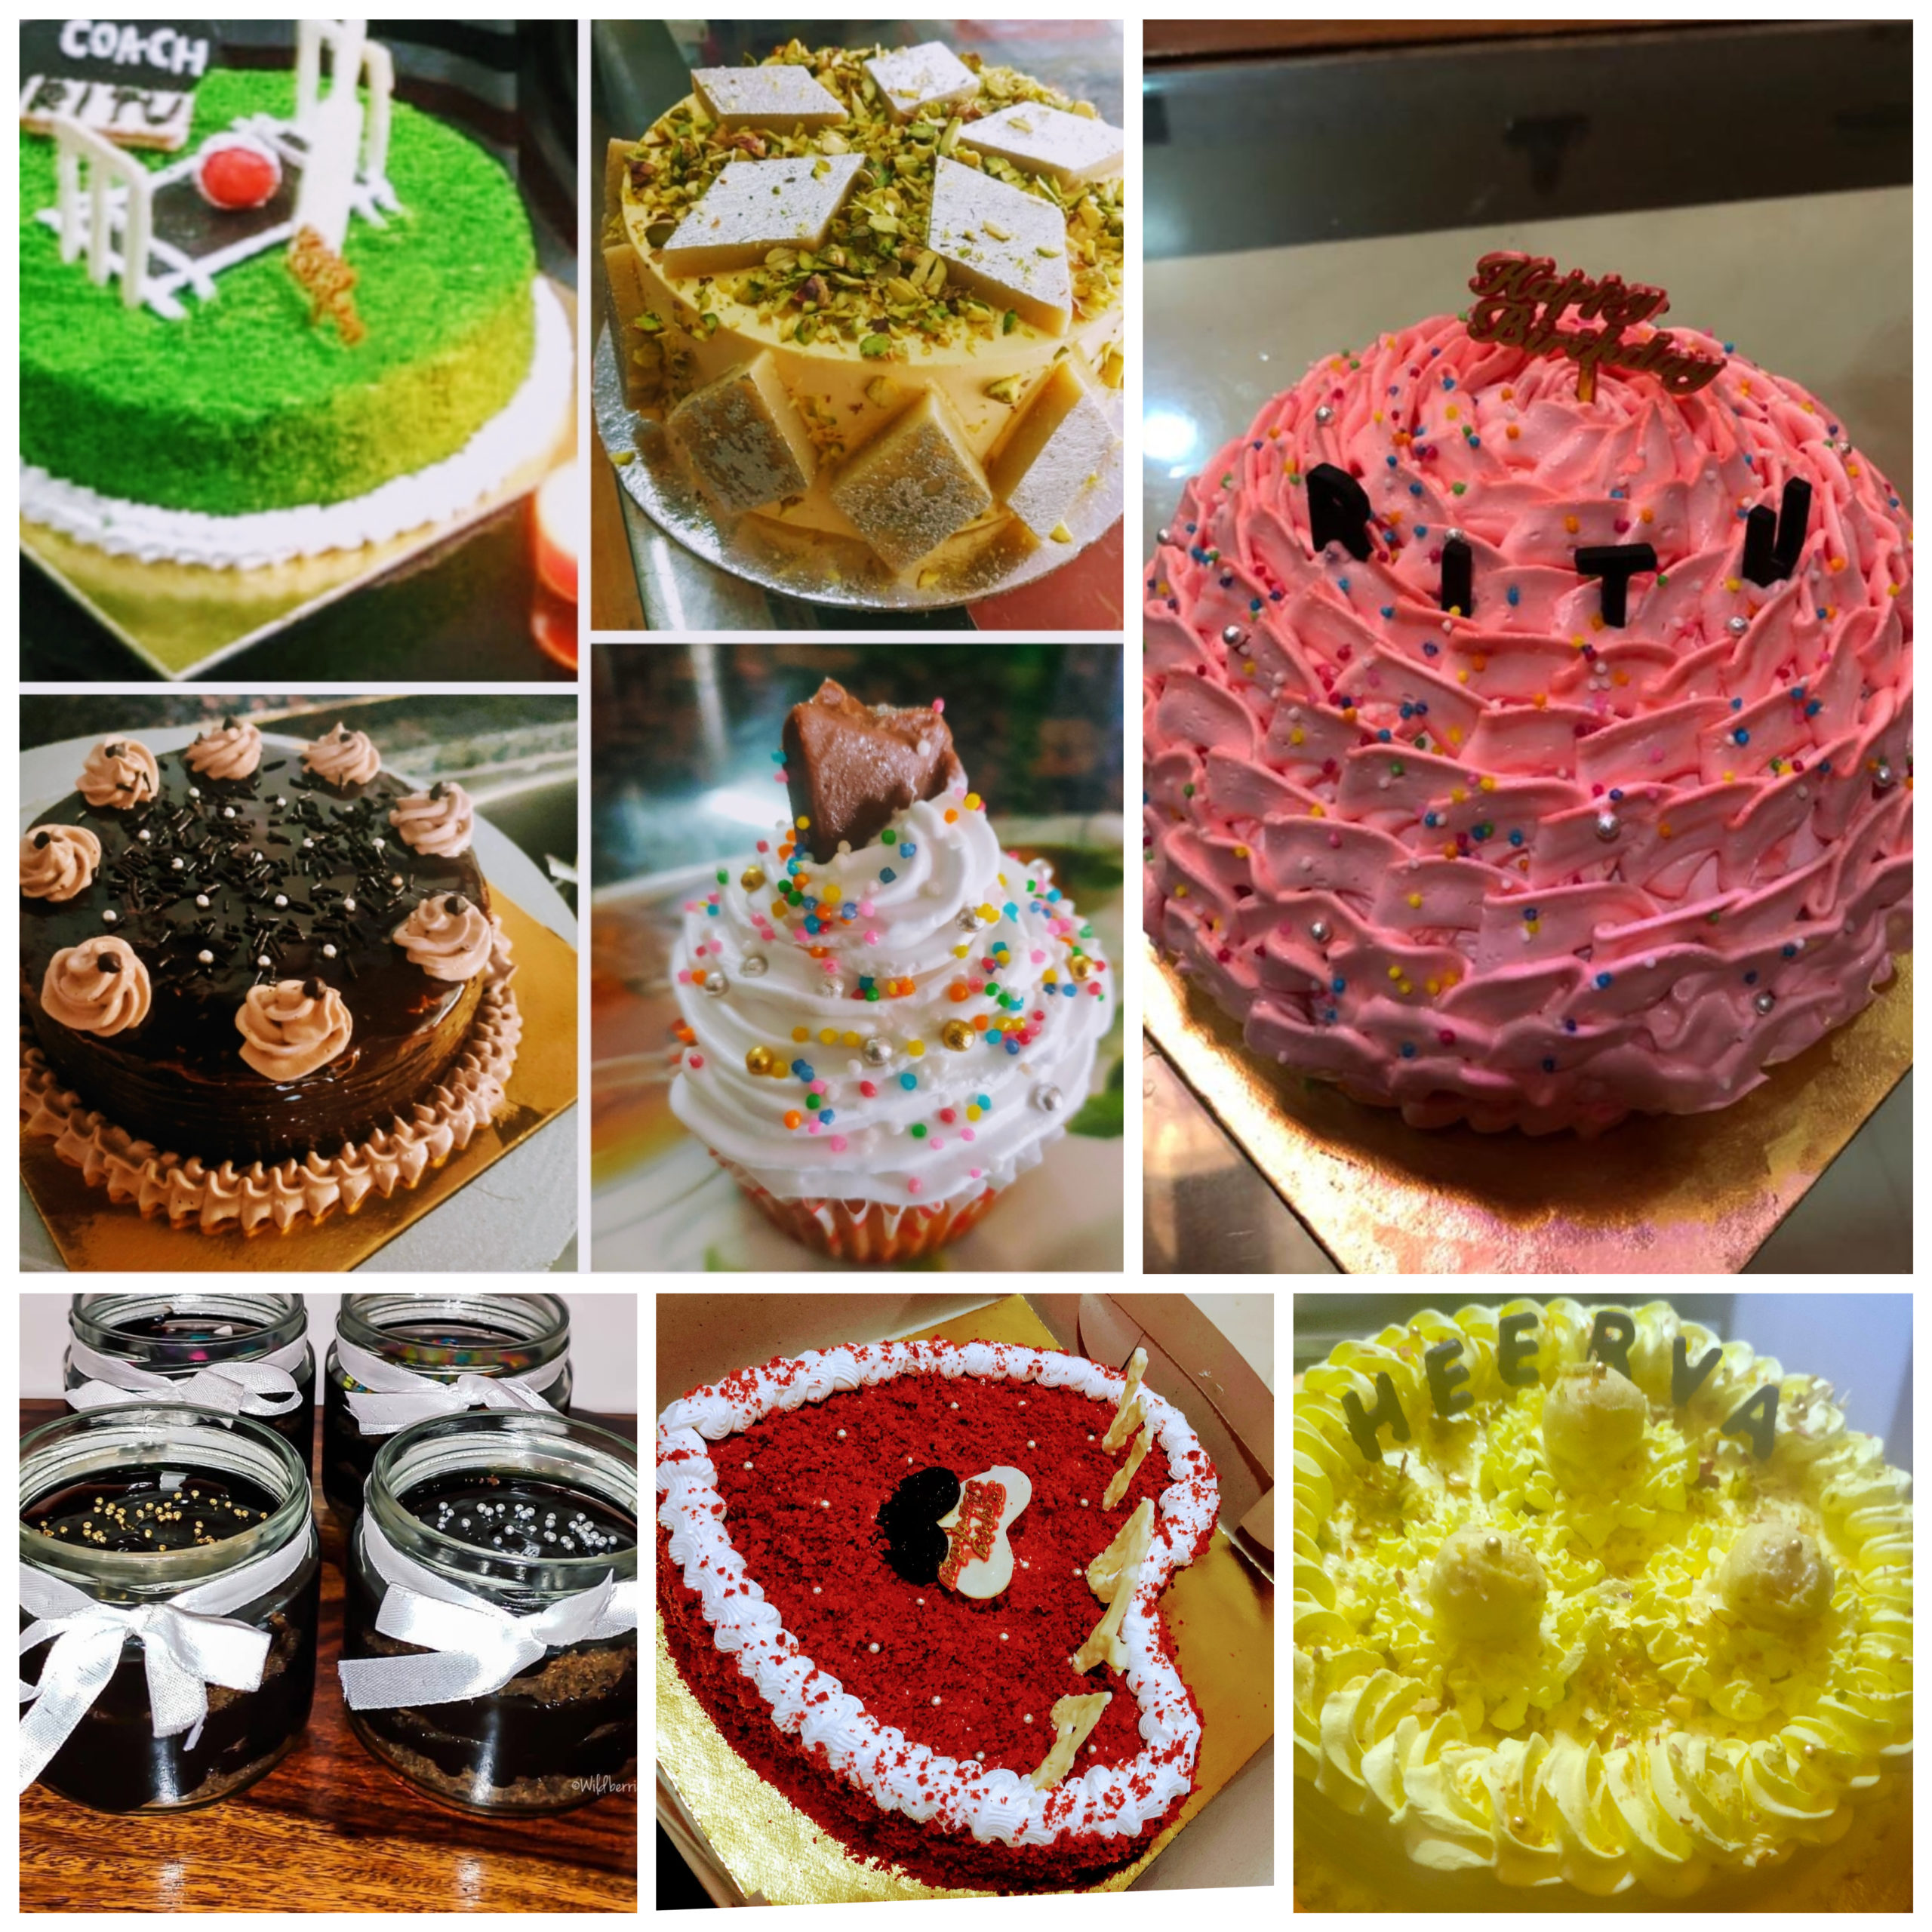 CakeYEN